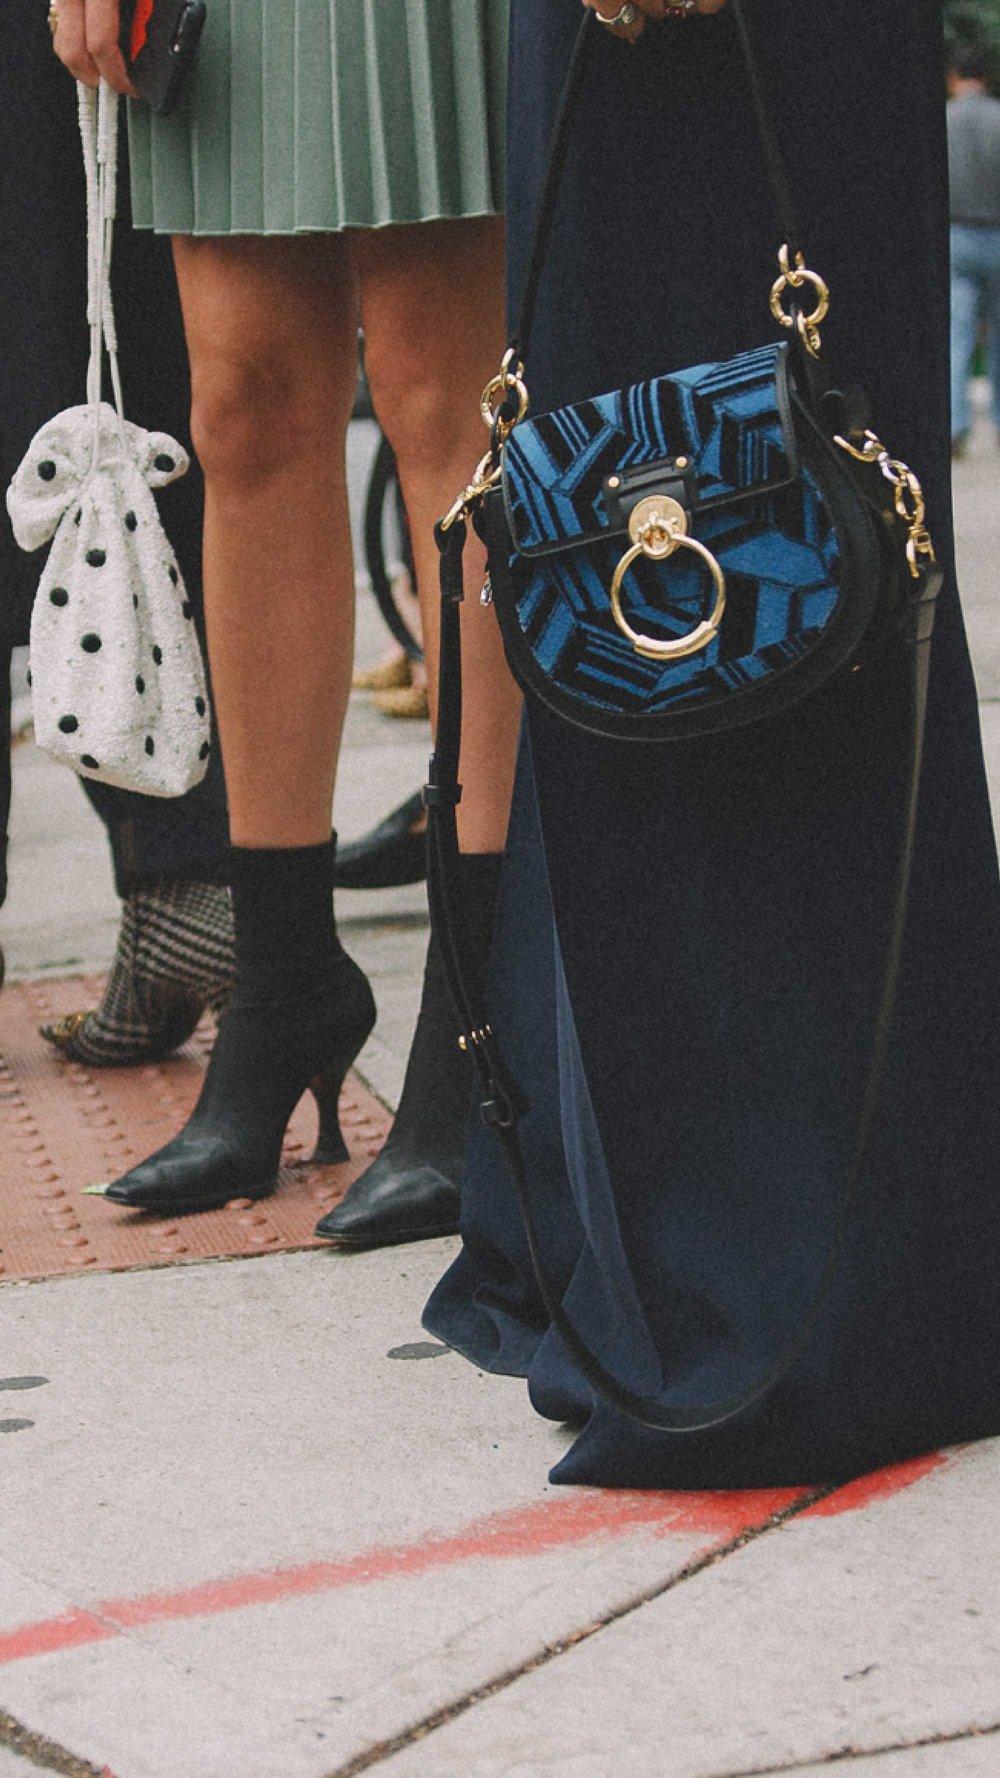 New-York-Fashion-Week-NYFW-SS18-street-style-day-three-SS1815.jpg